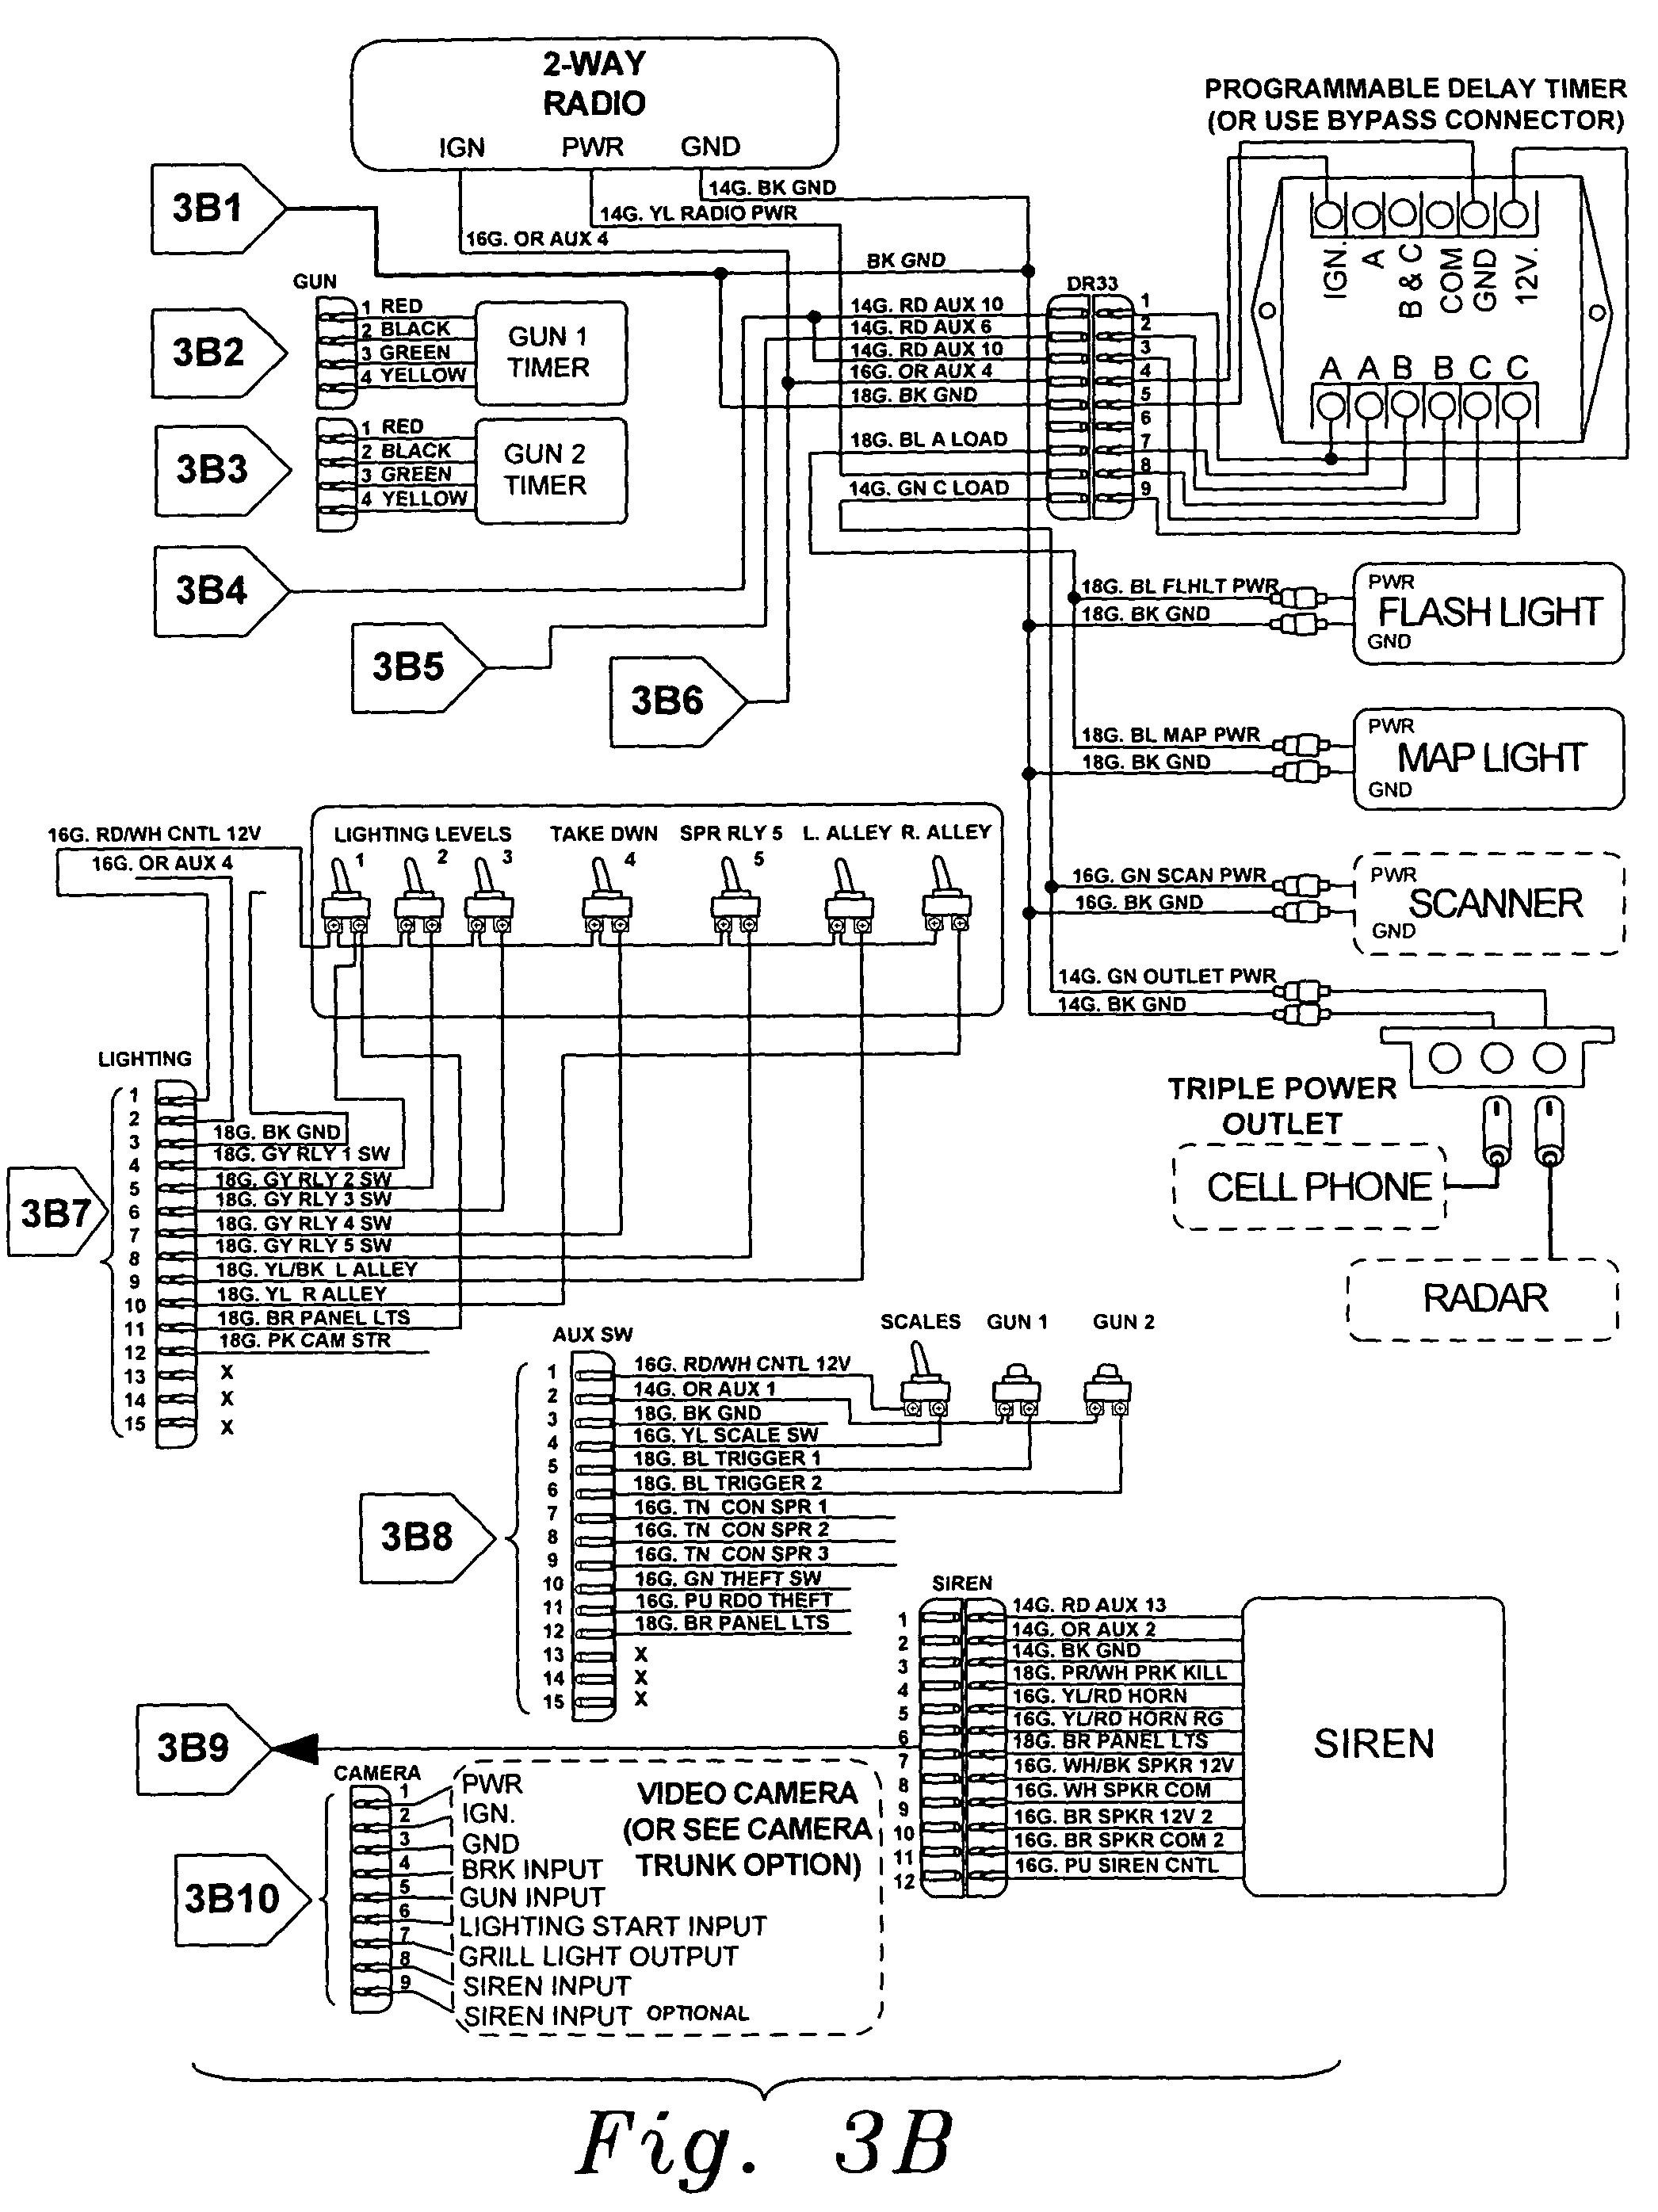 Whelen Tir3 Wiring Diagram Whelen Siren Wiring Diagram Wiring Diagram Of Whelen Tir3 Wiring Diagram